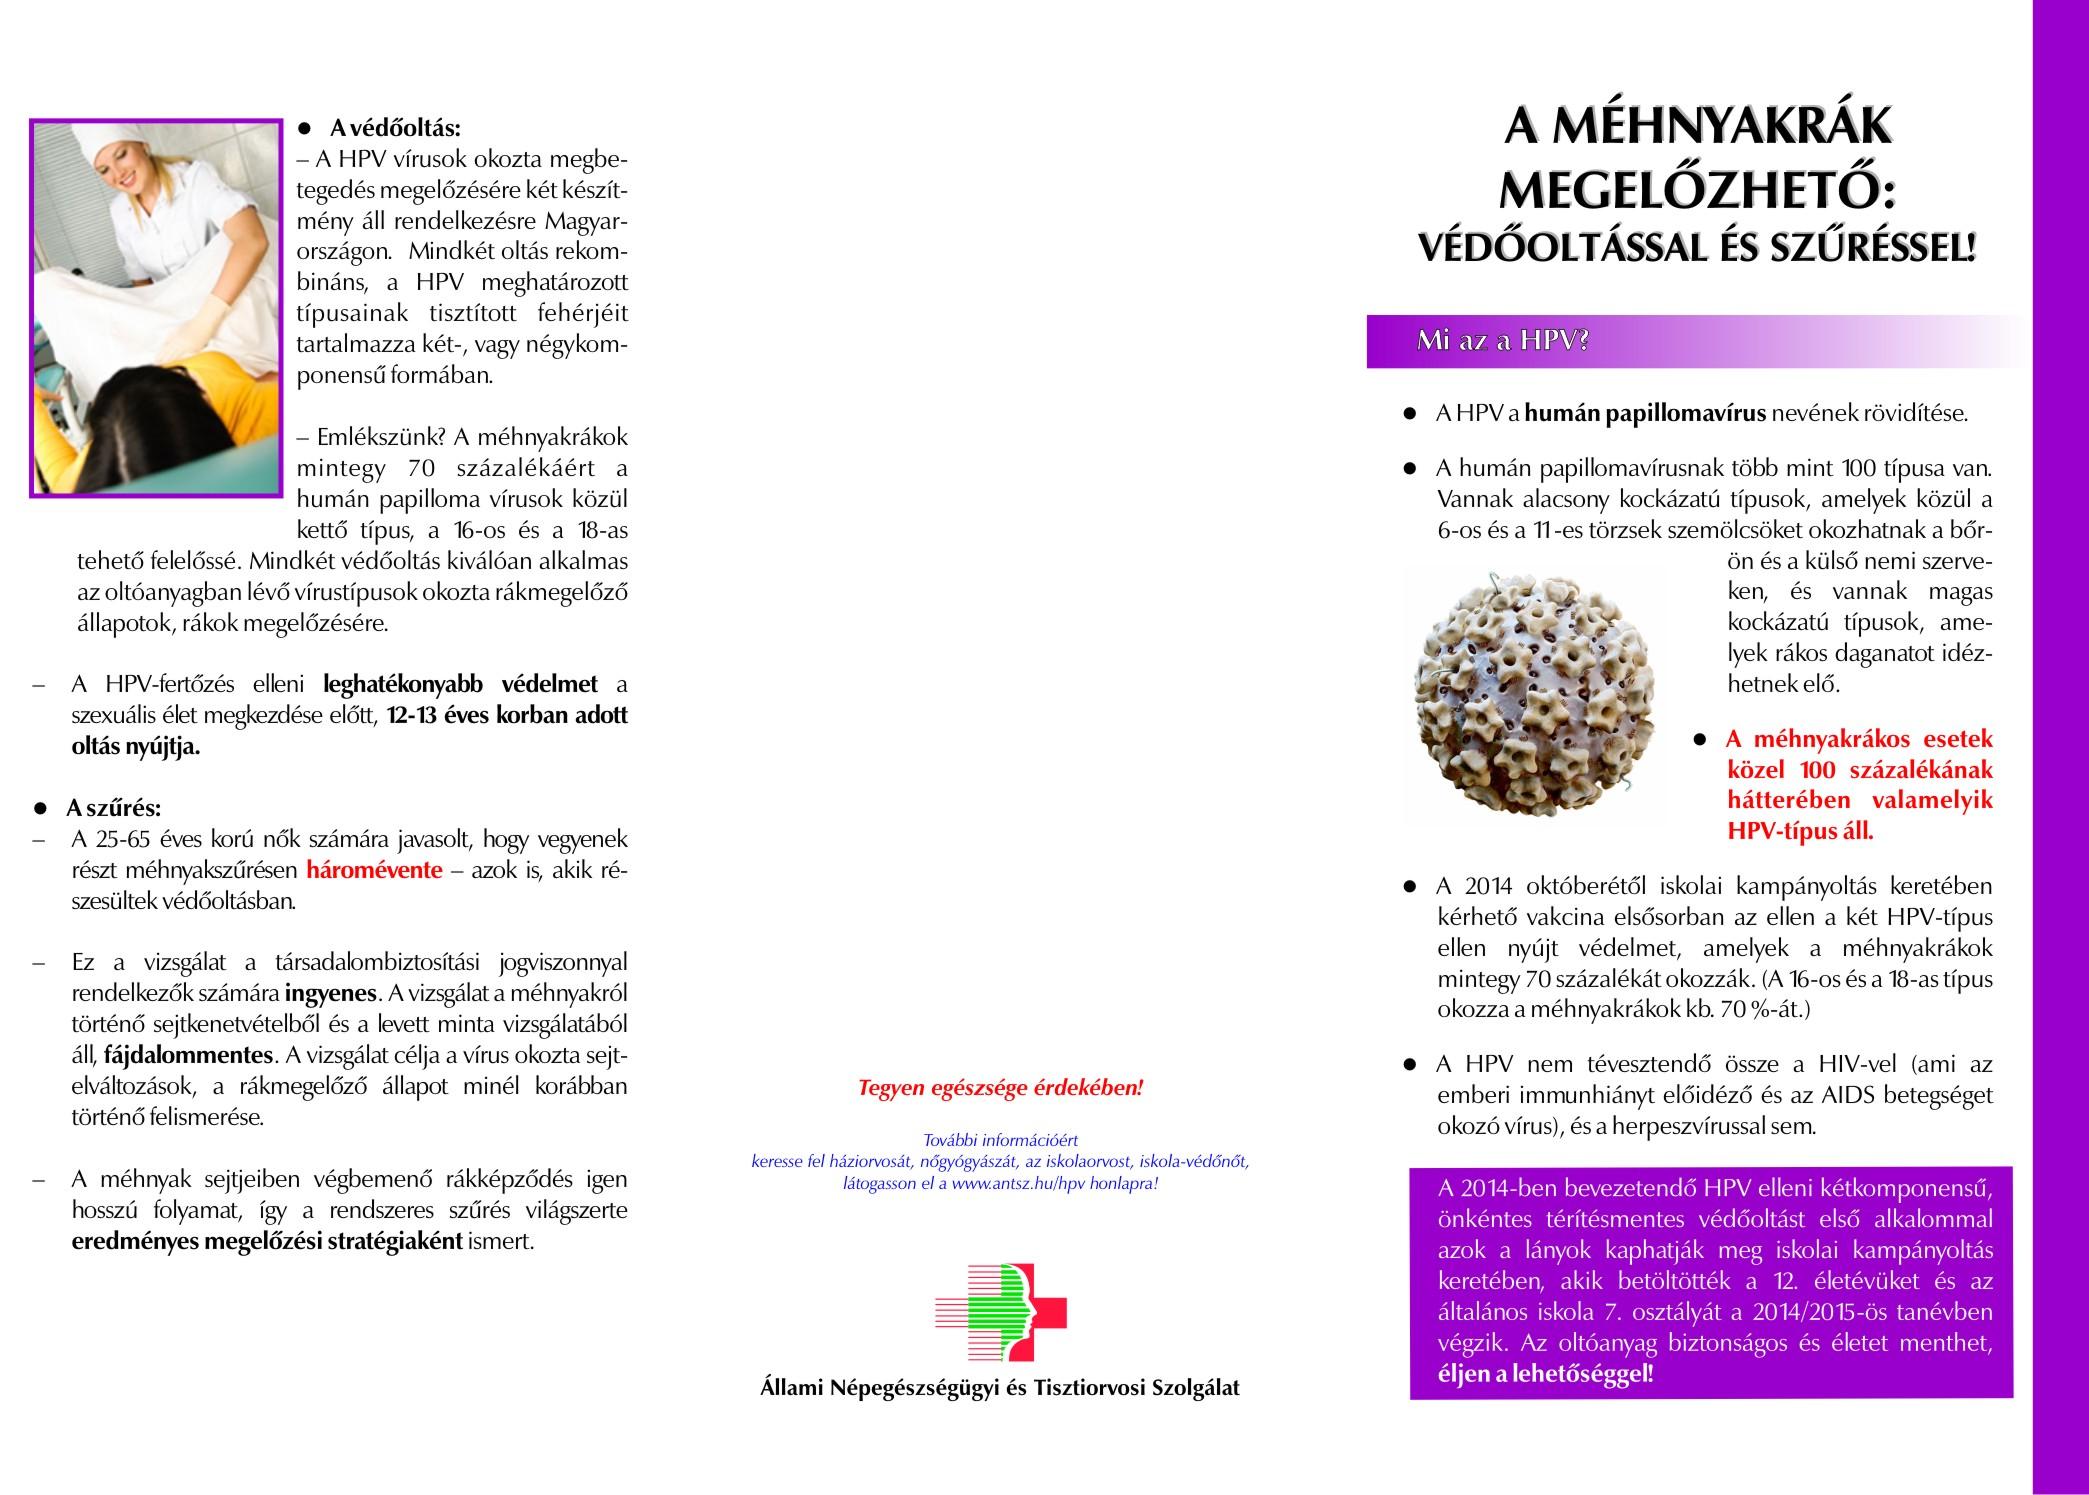 papilloma vírus elleni vakcina új)